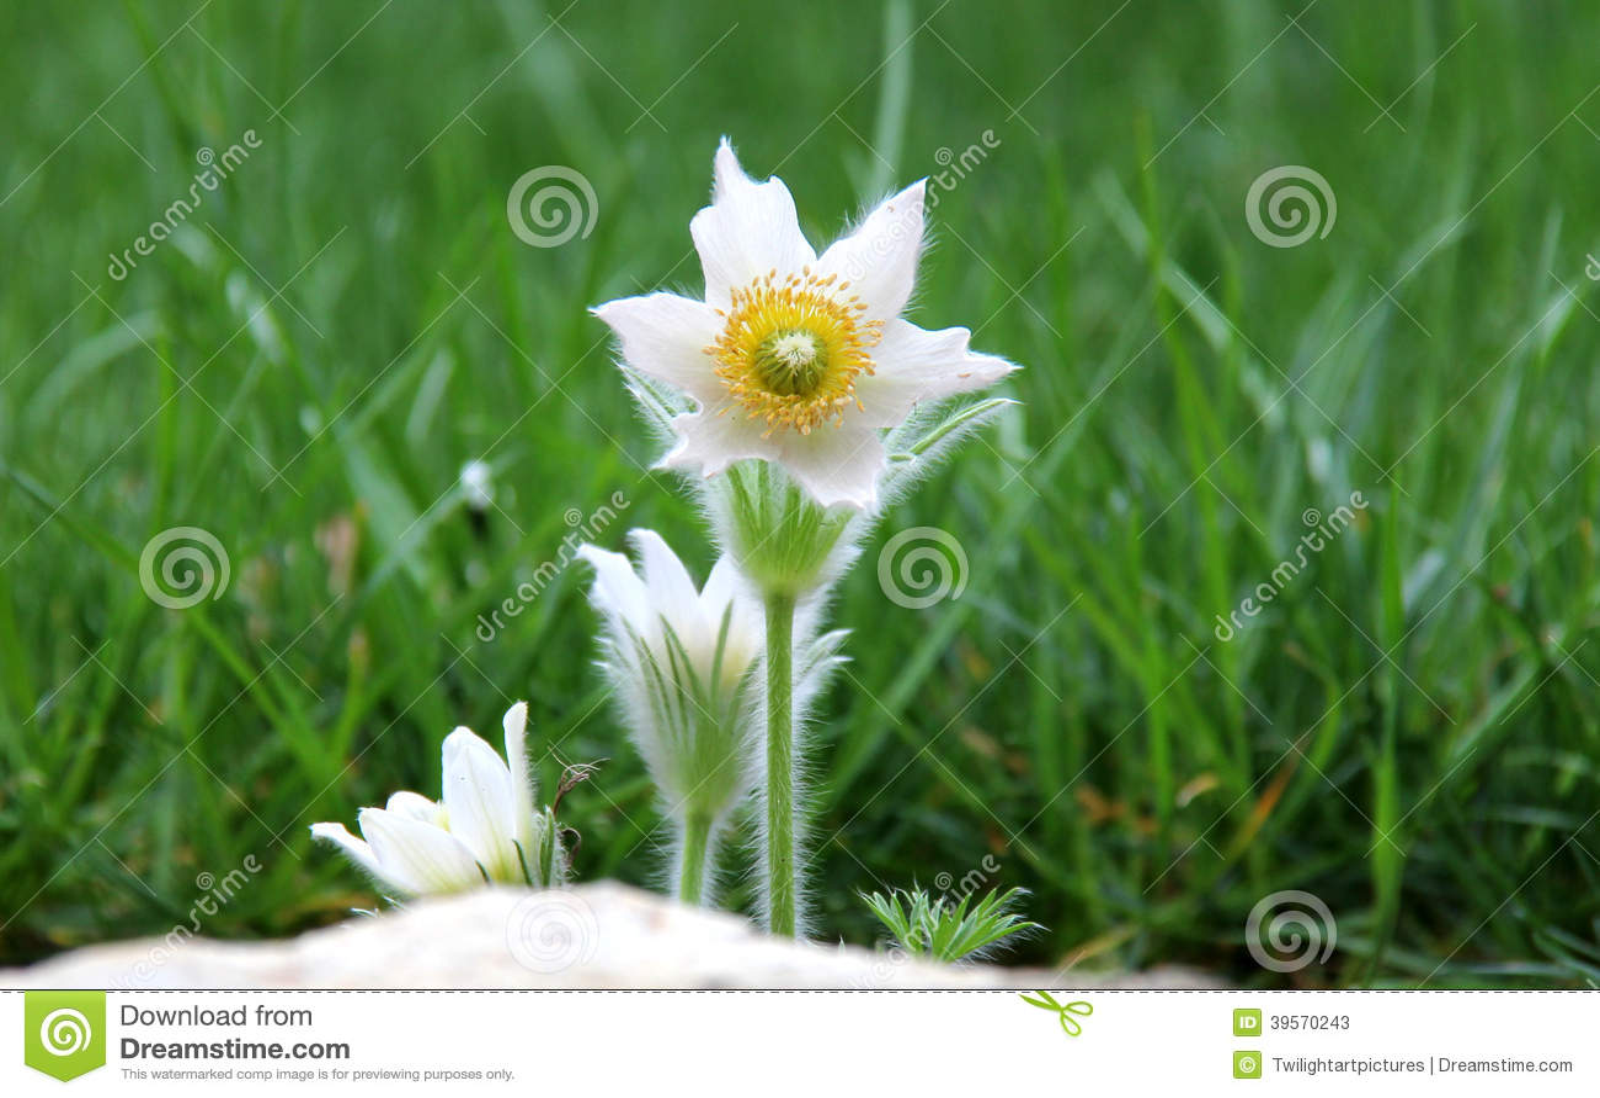 Pasque blommor